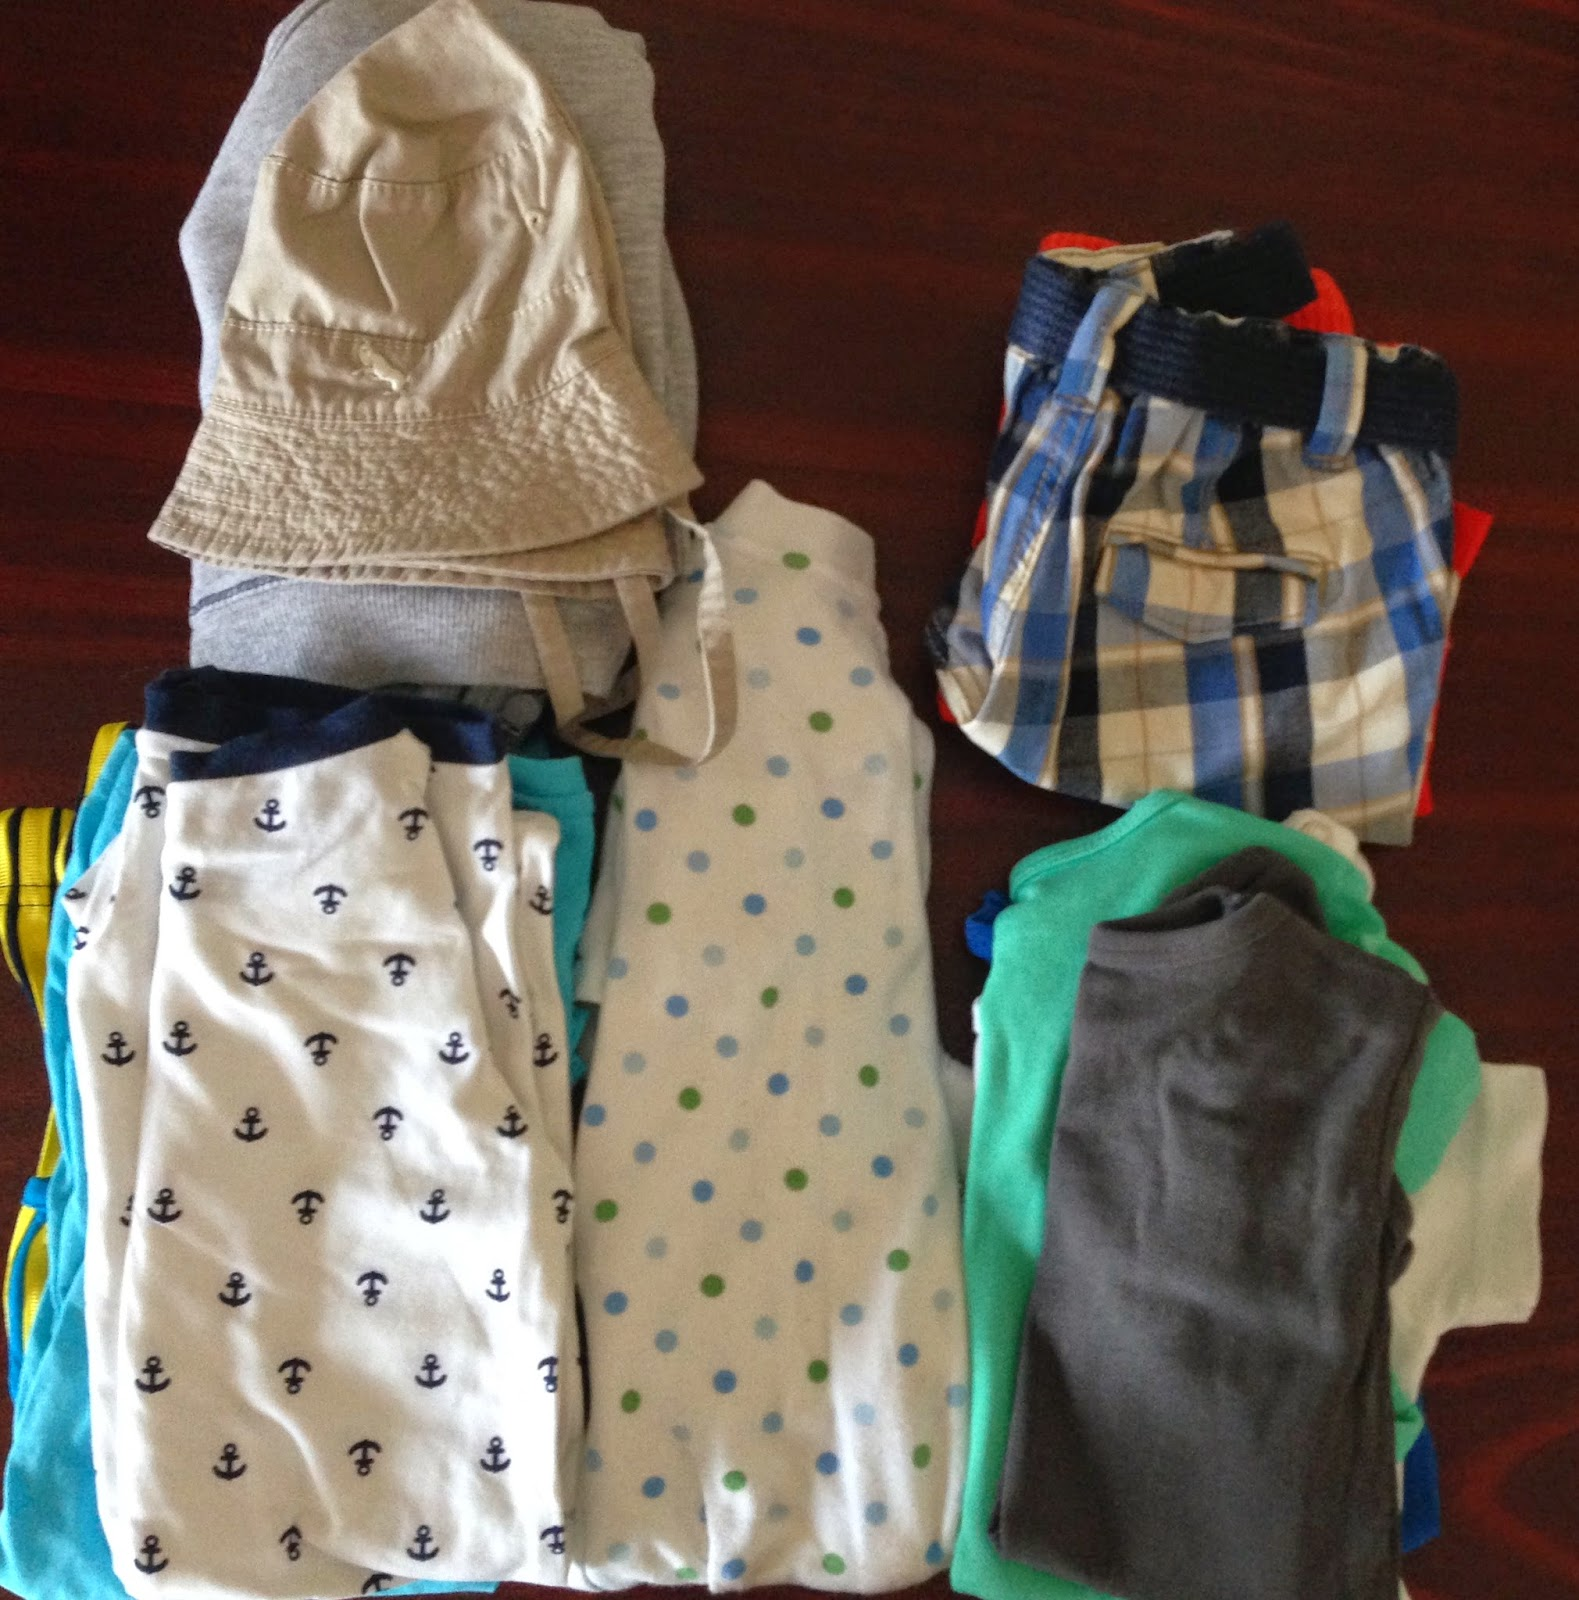 La mare cu bebelusul – Pregatiri